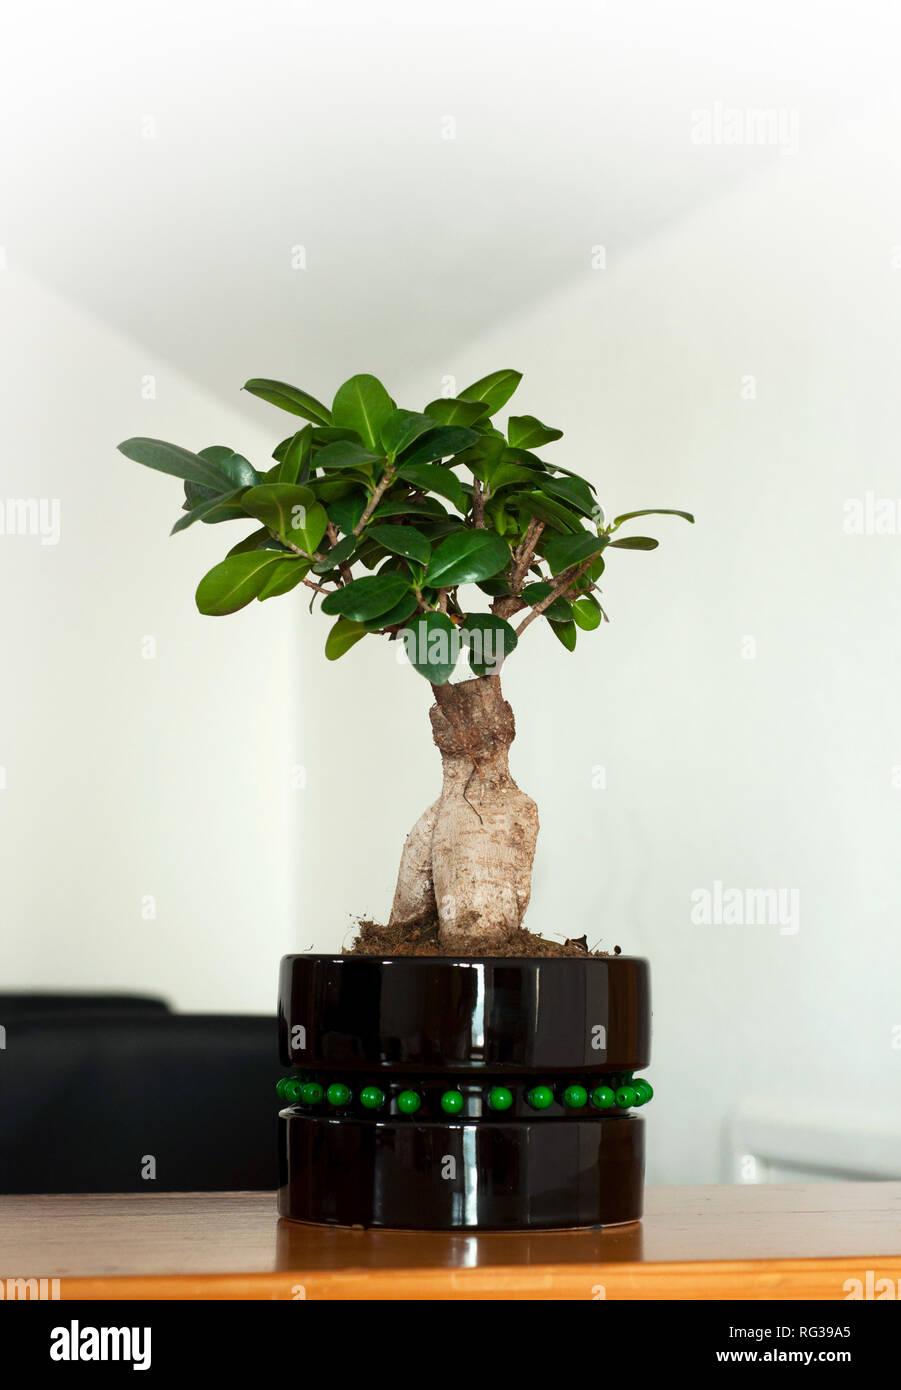 Close Up View Of A Beautiful Bonsai Ficus Ginseng In A Black Pot Feng Shui Mini Tree Stock Photo Alamy